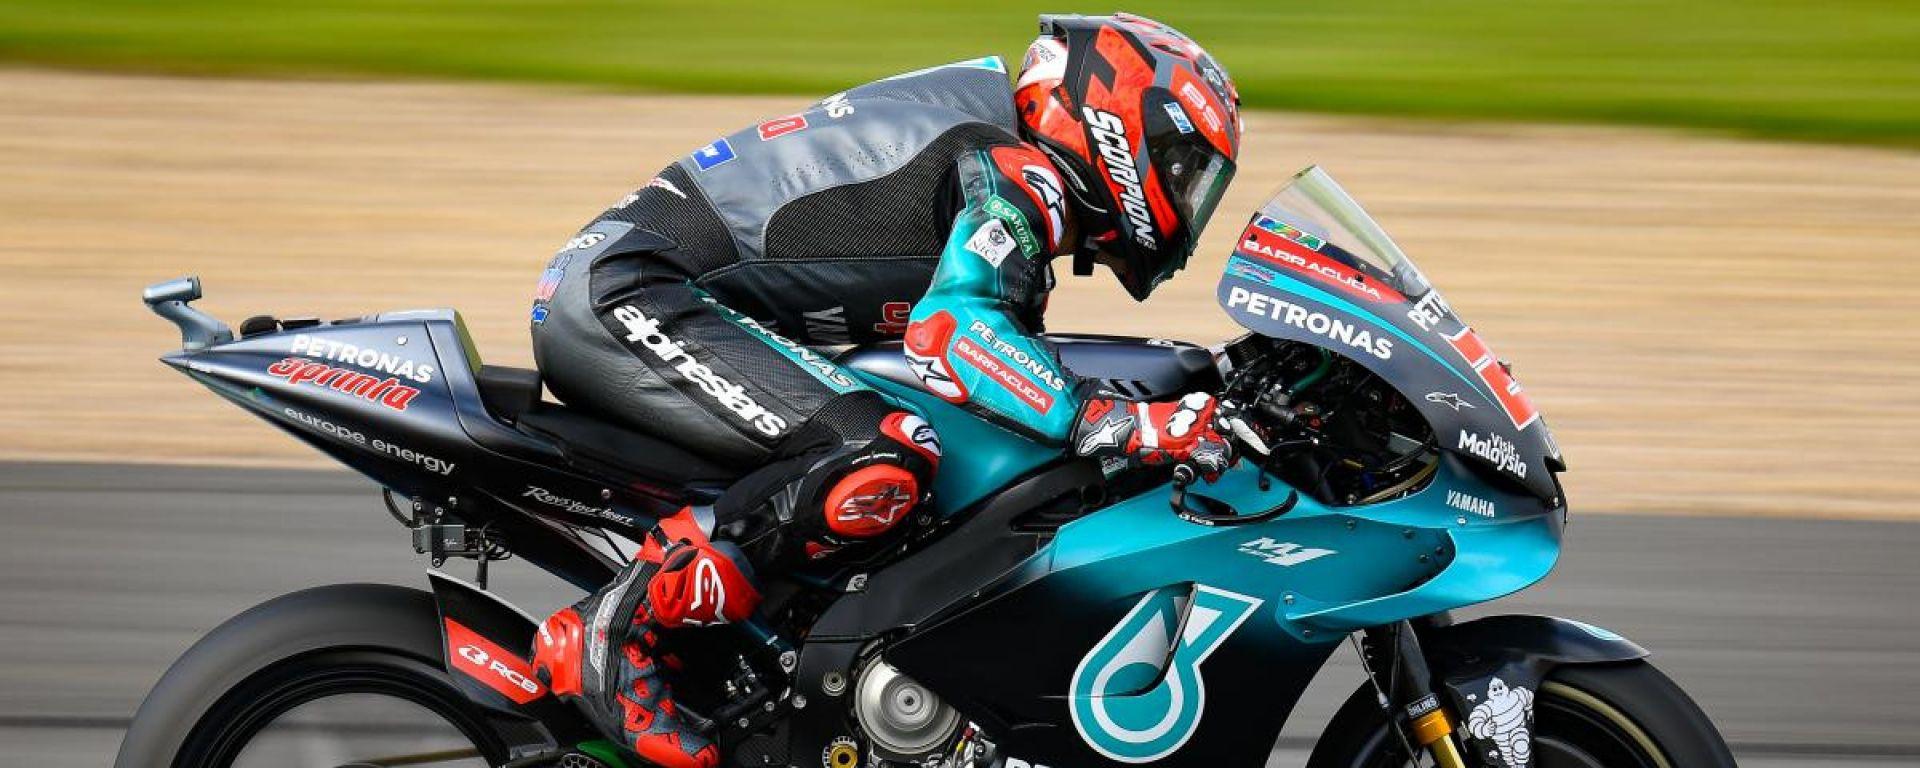 MotoGP Silverstone, FP3: Quartararo 1° davanti a Rossi